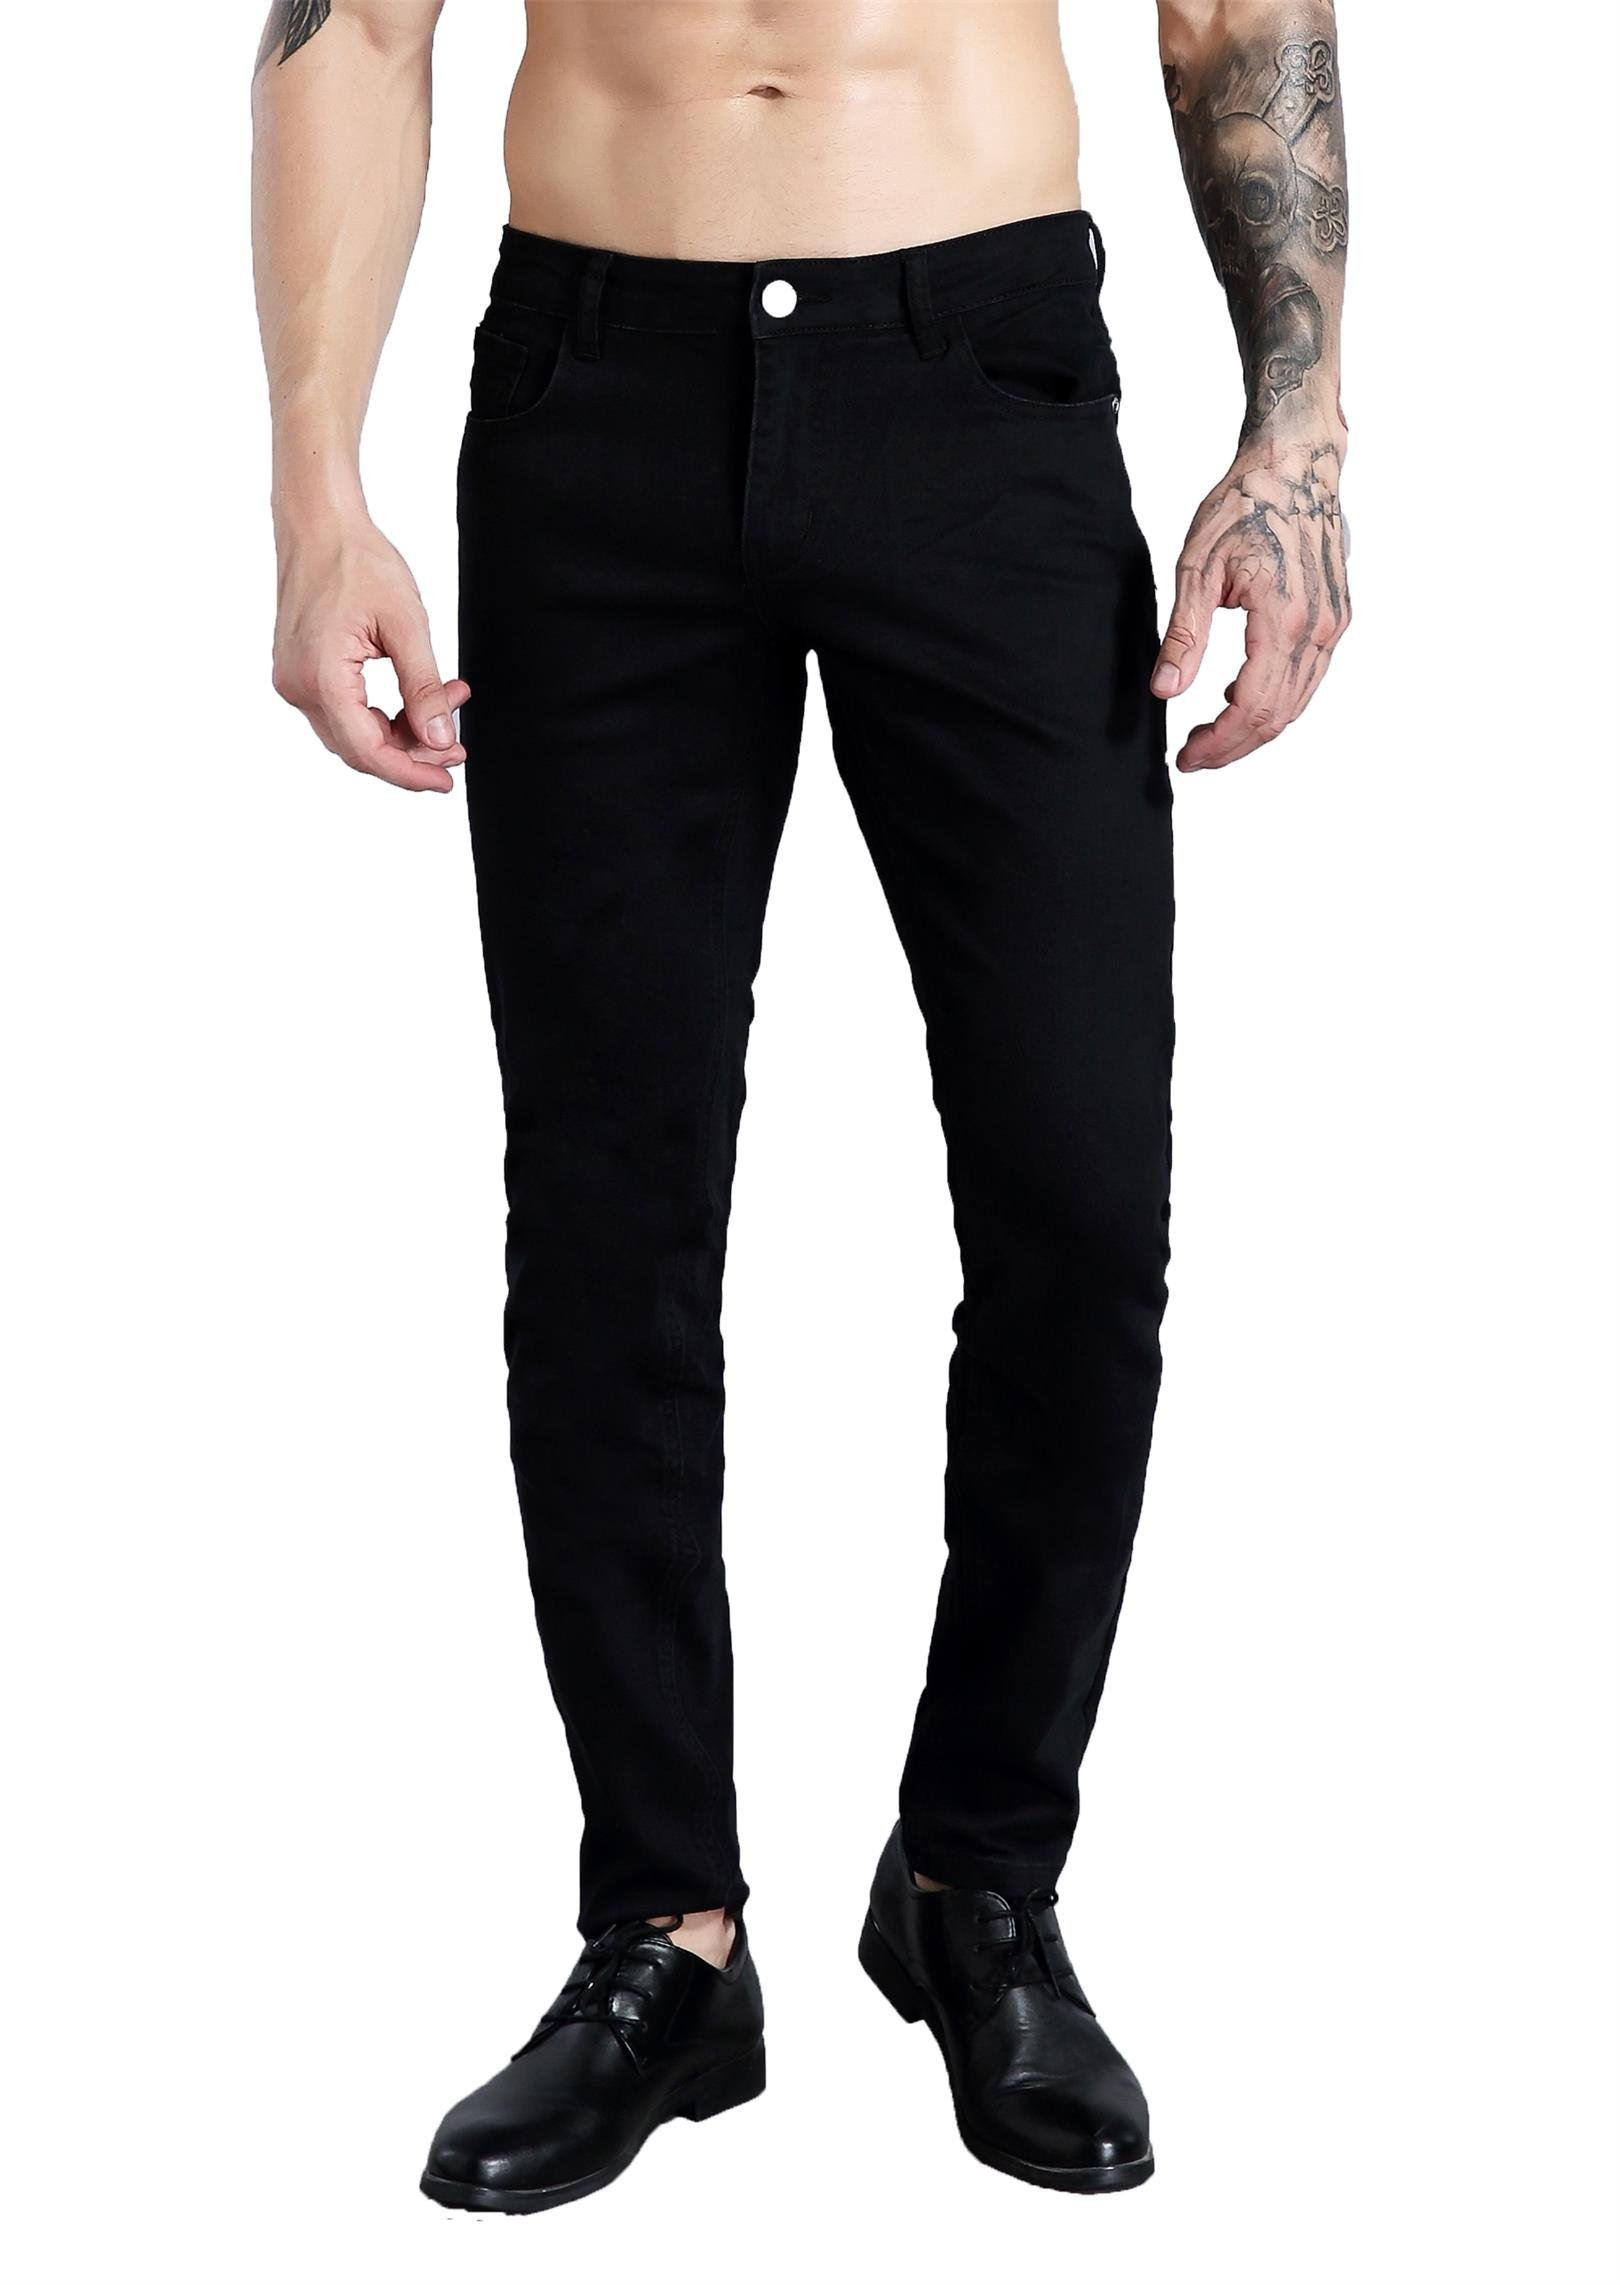 ZLZ Slim Fit Jeans for Men Super Comfy Stretch Skinny Straight Leg Fashion JeansPants (36, Black) by ZLZ